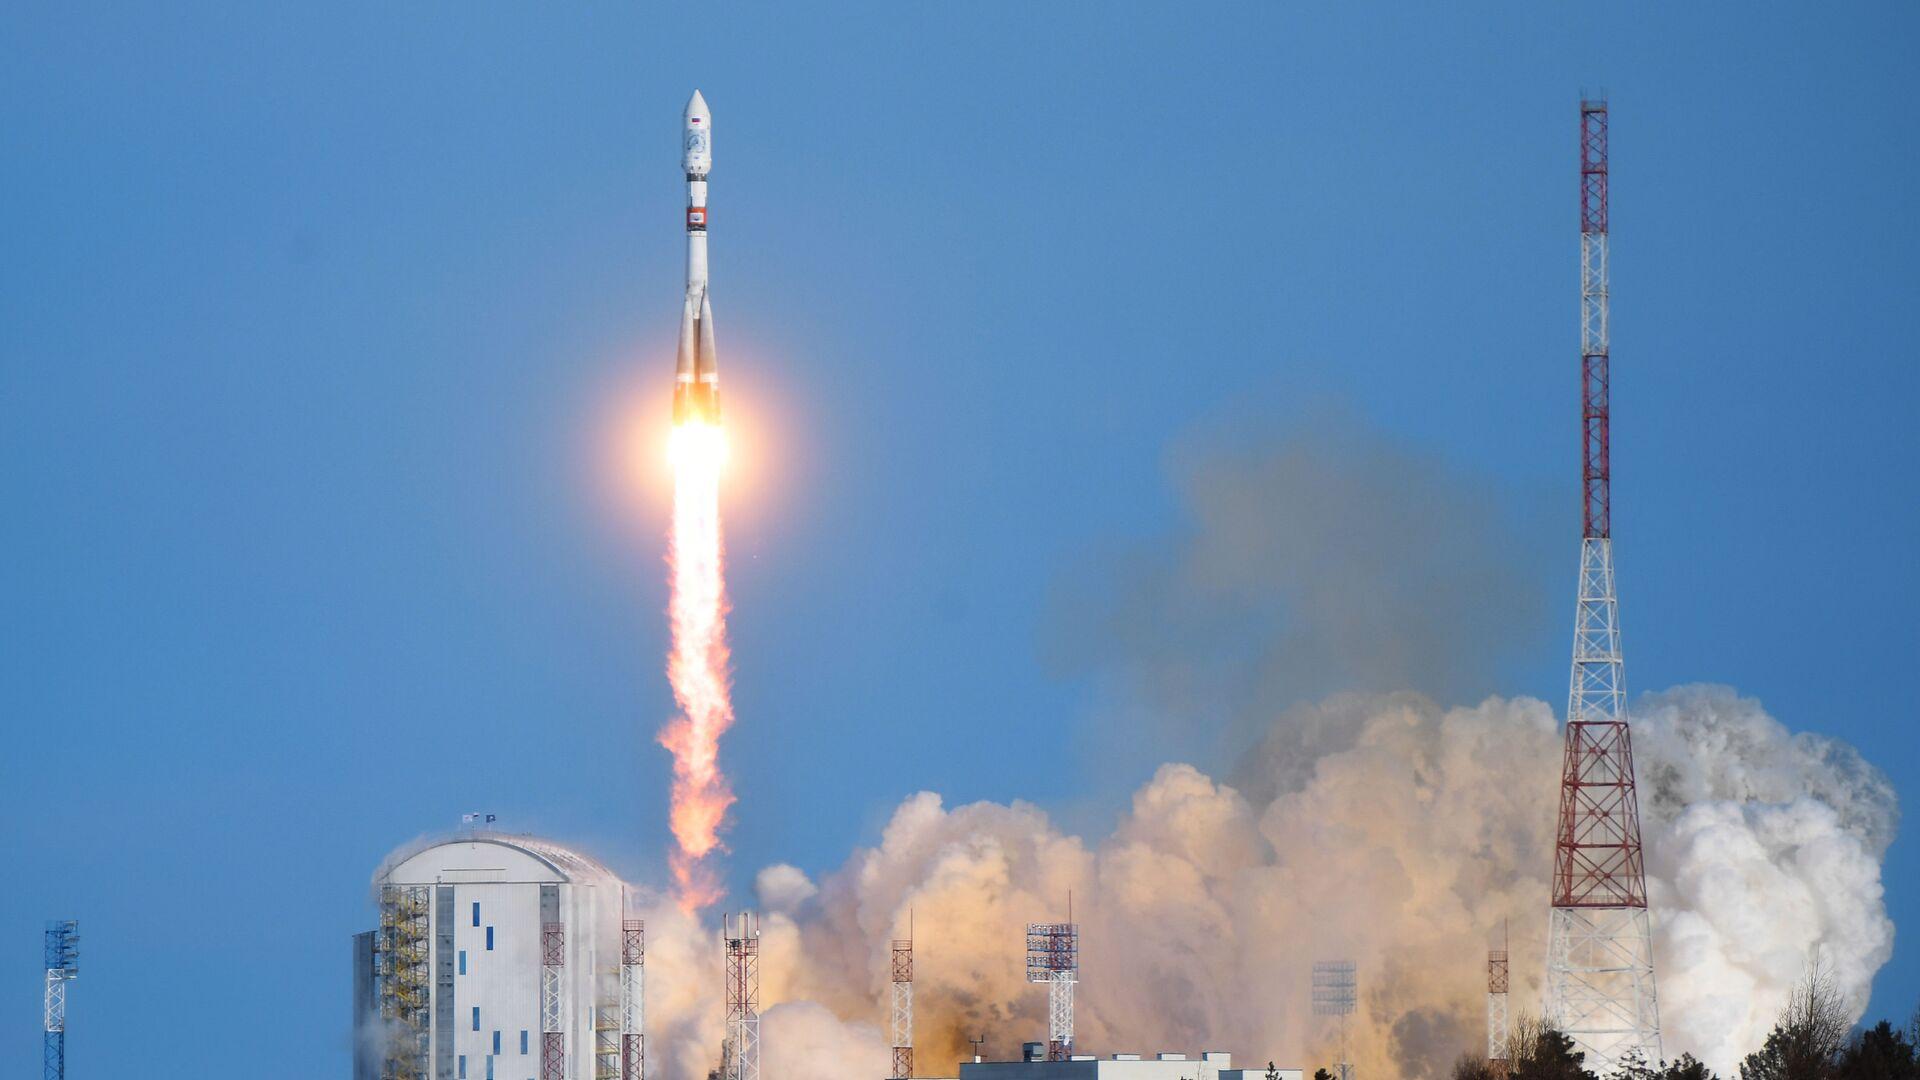 Lancio del razzo Soyuz-2.1а dal cosmodromo  - Sputnik Italia, 1920, 25.03.2021